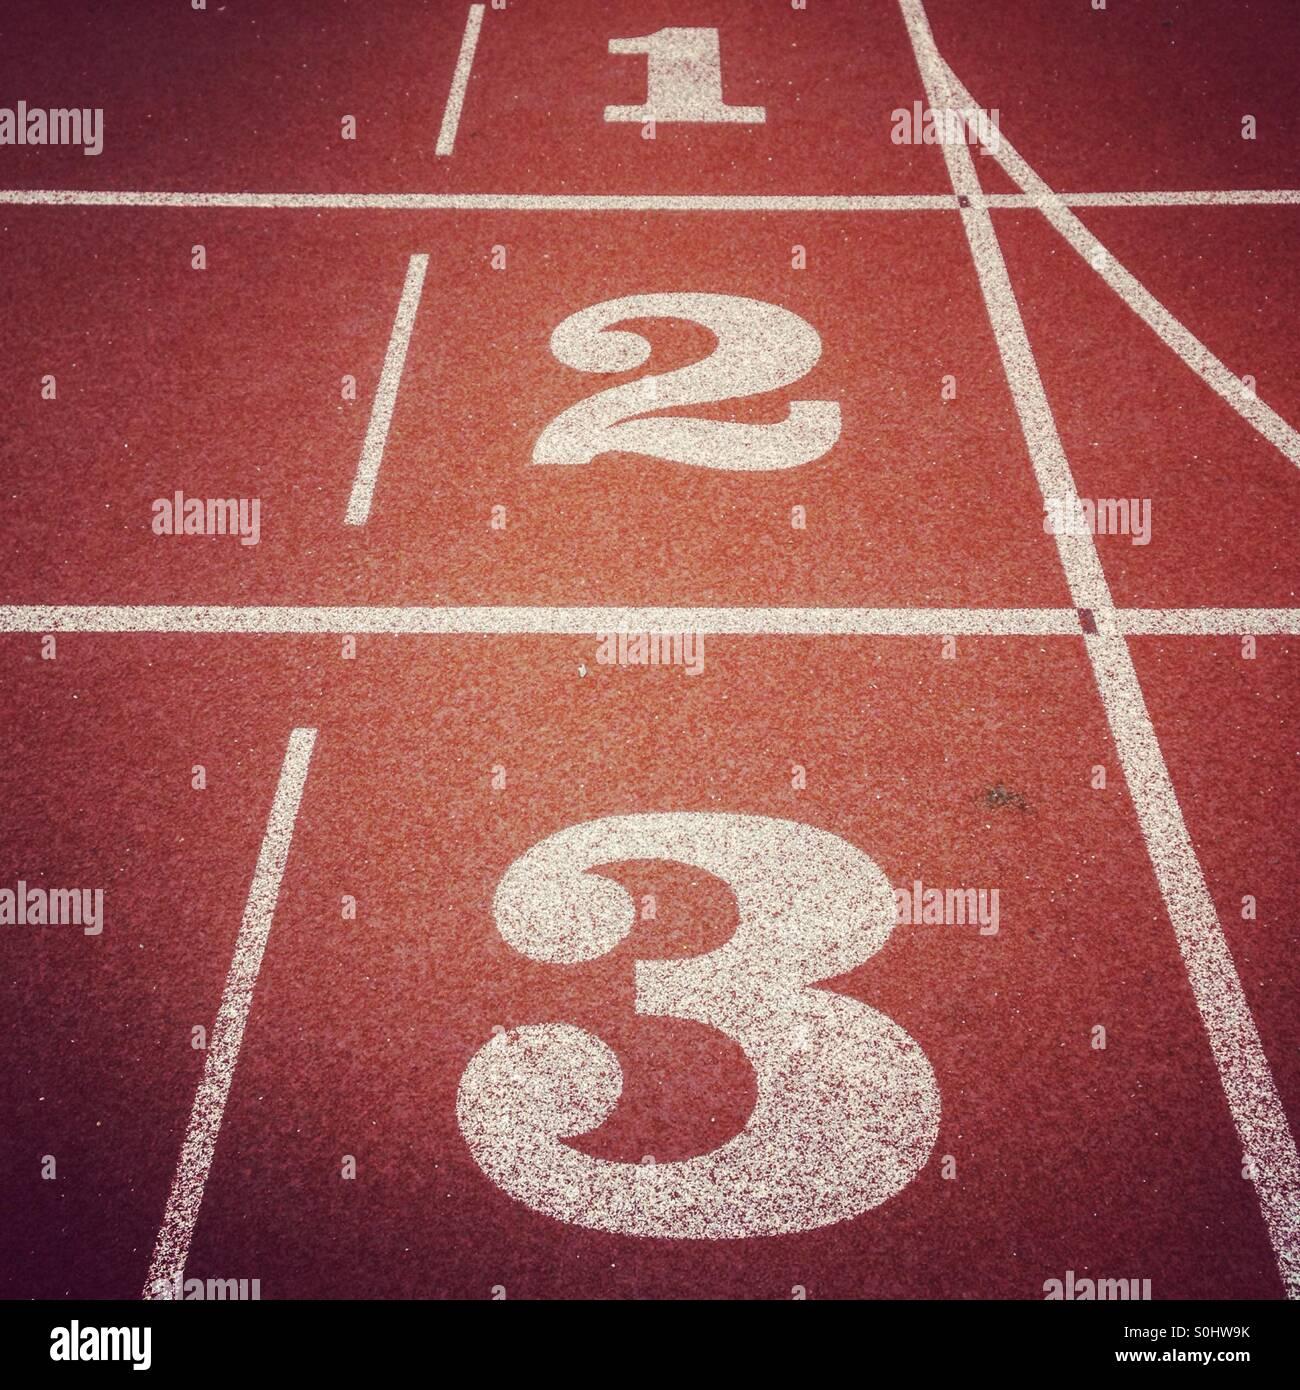 Leichtathletik-Track-Nummern Stockbild